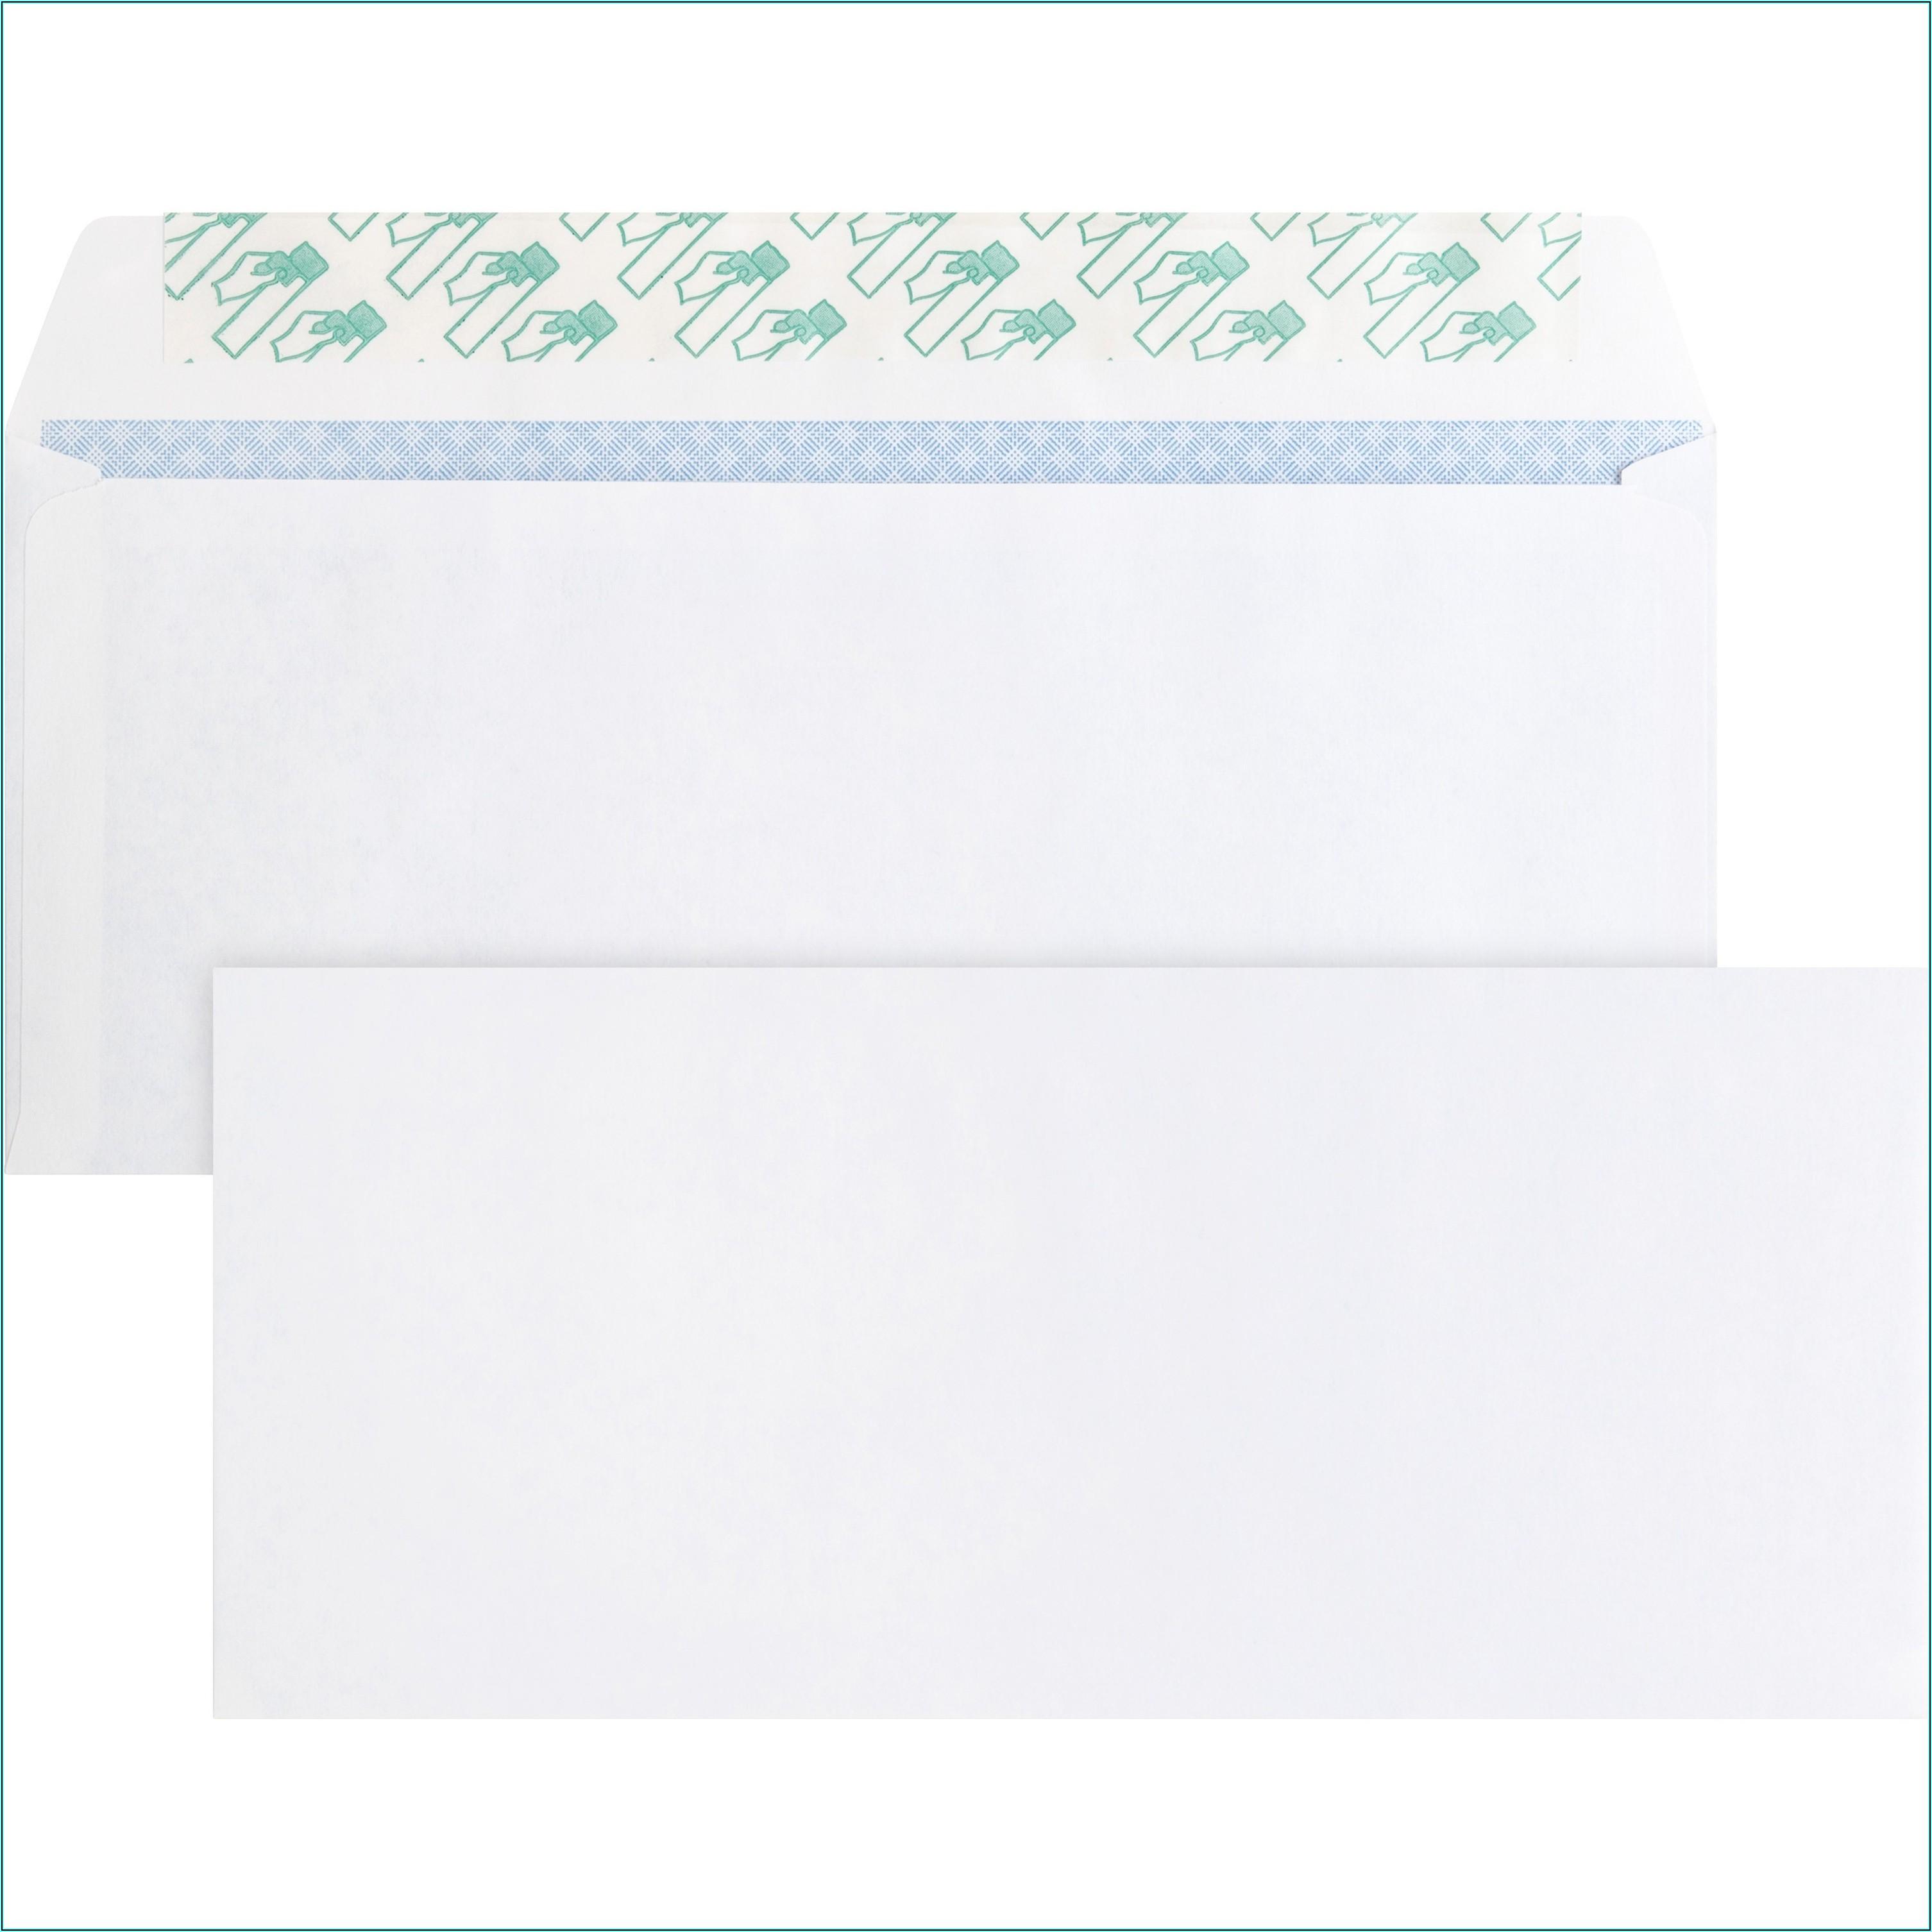 Columbian Security Tint Envelopes Grip Seal No. 10 500 Count